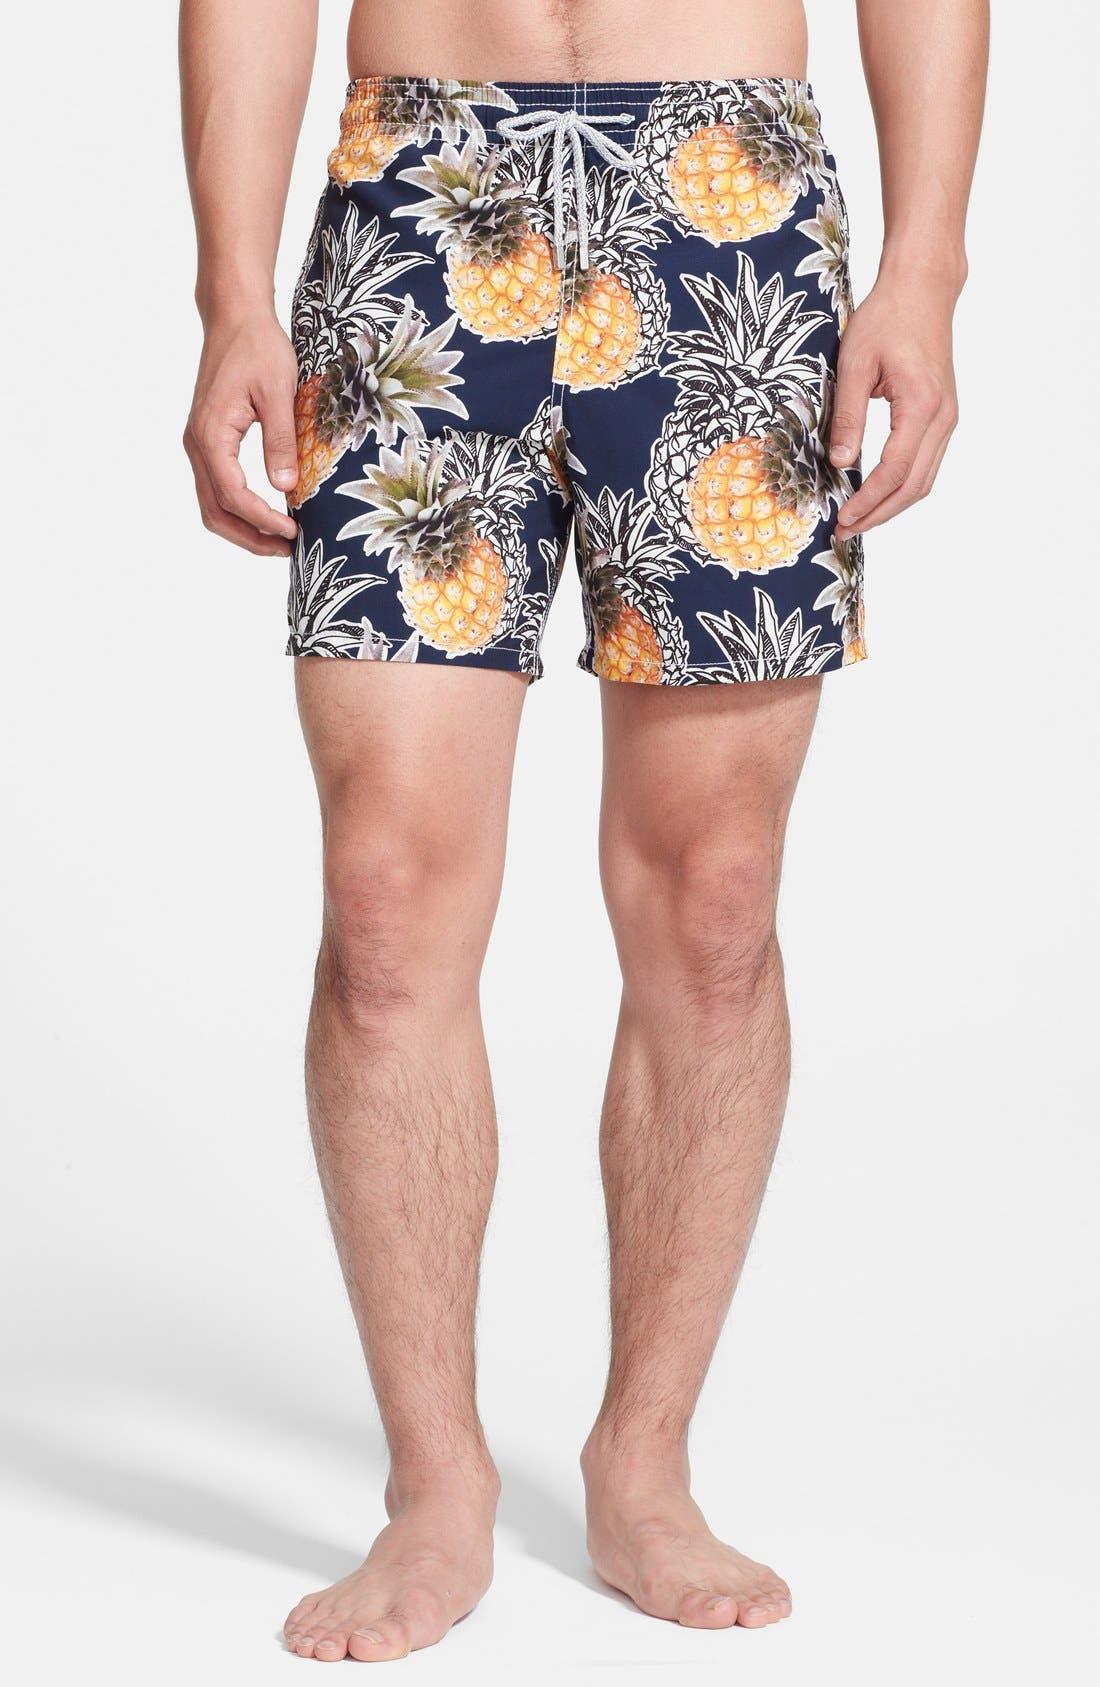 Alternate Image 1 Selected - Vilebrequin 'Moorea' Pineapple Print Swim Trunks